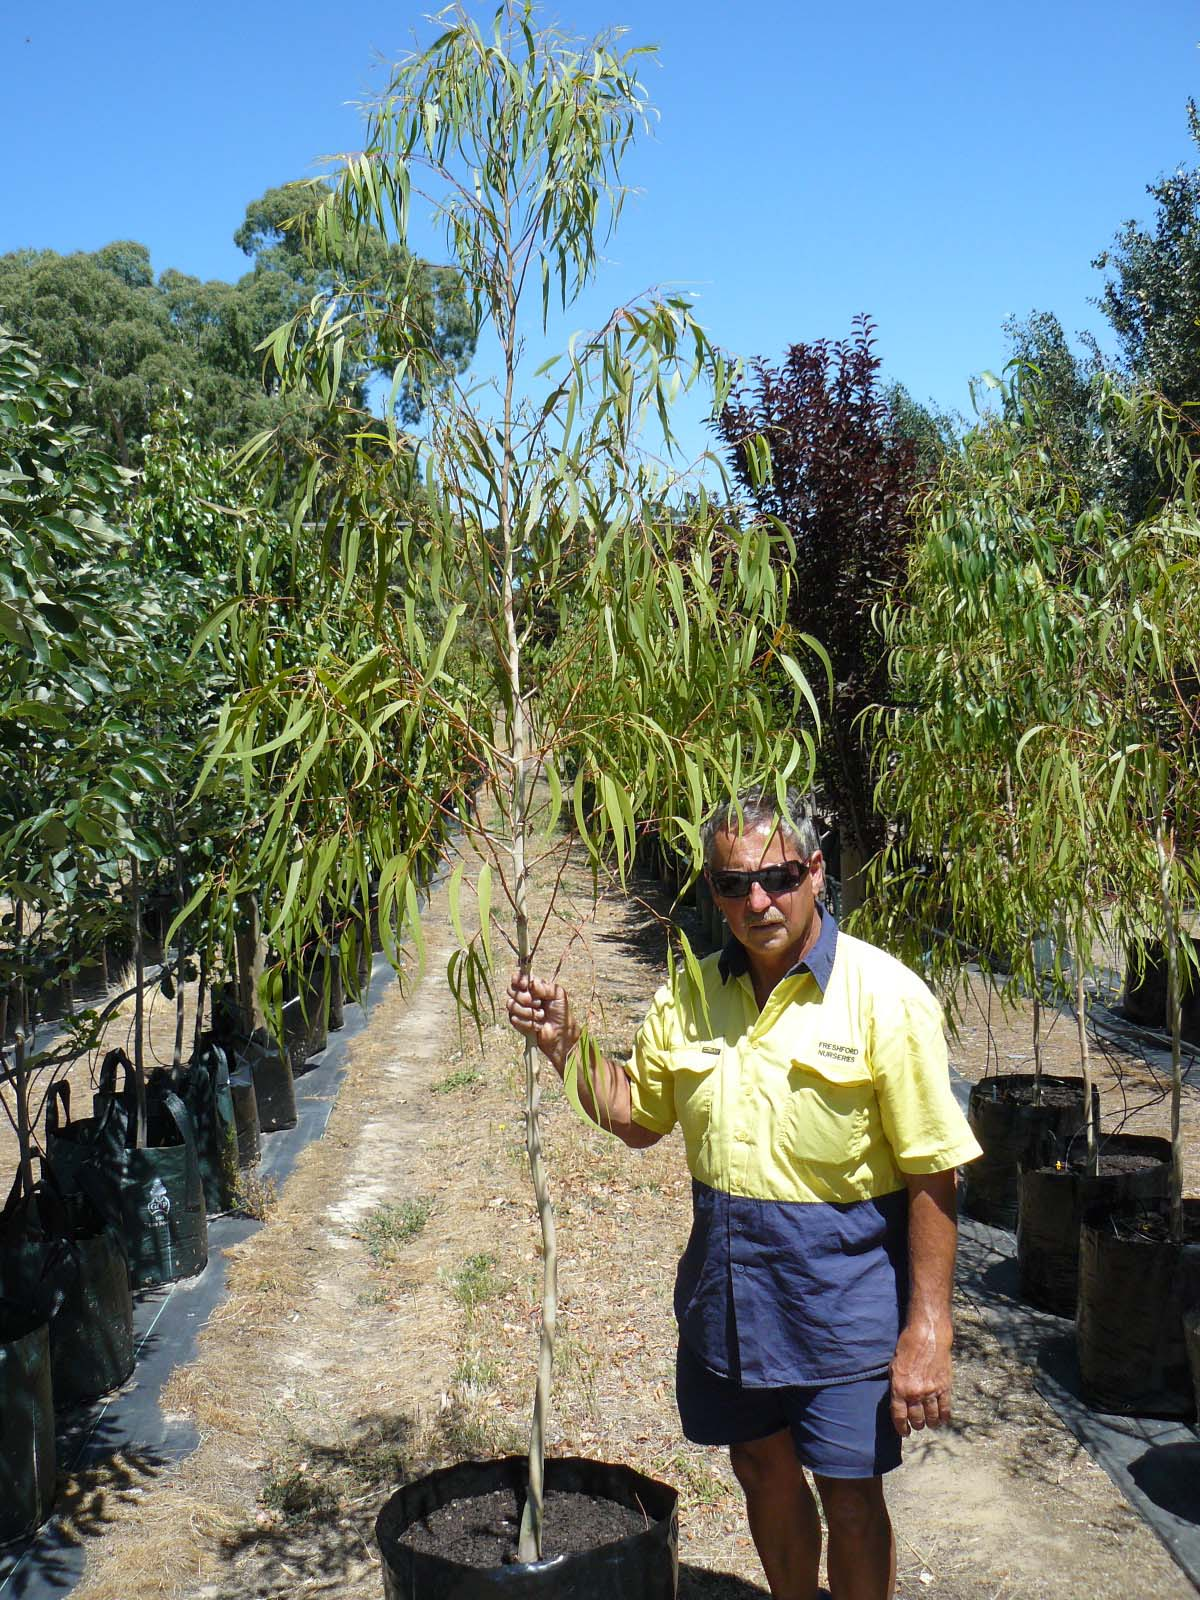 Corymbia (Eucalyptus) citriodora scentious